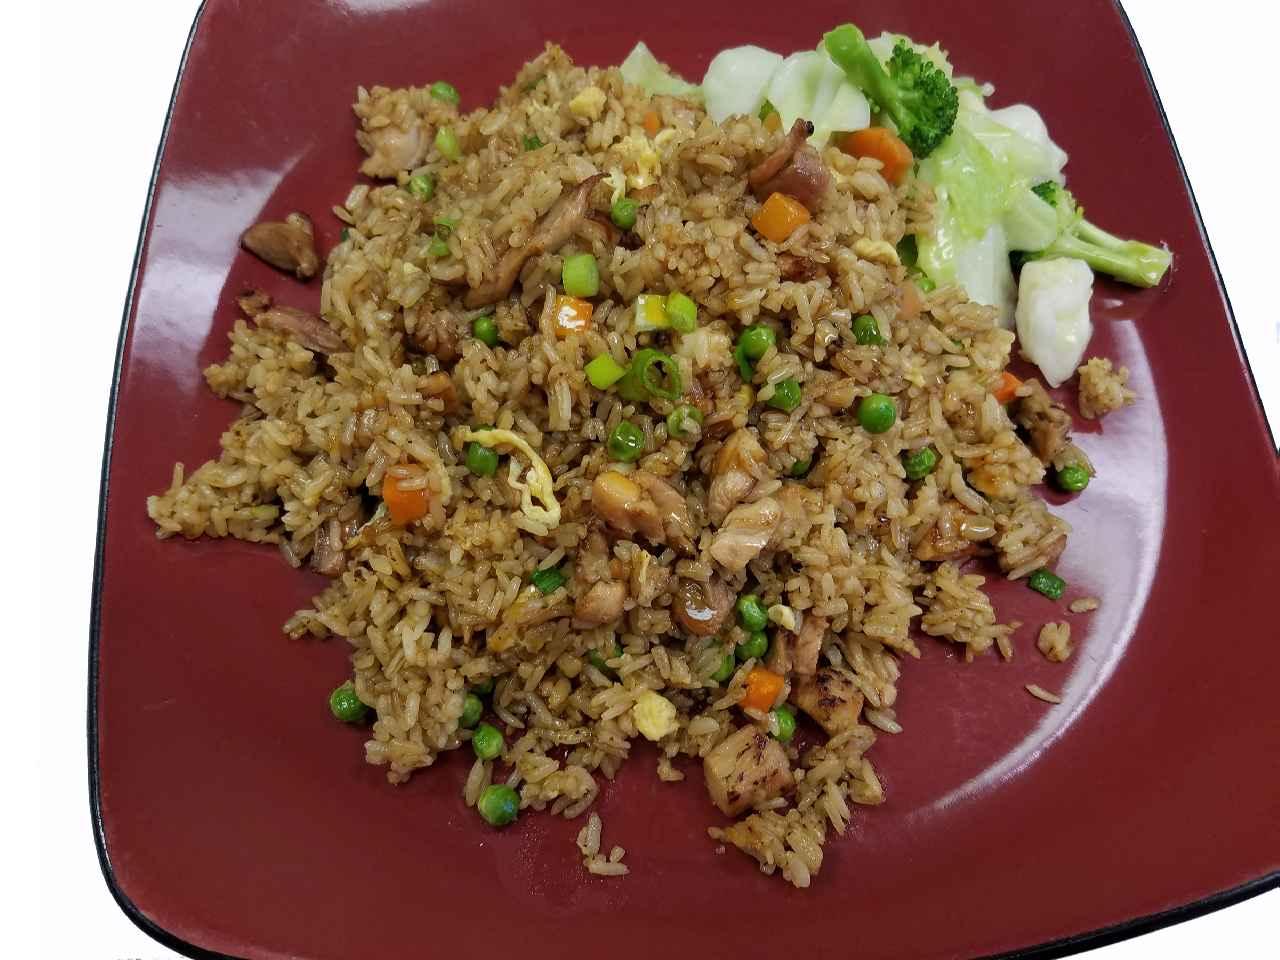 #8. Chicken Fried Rice